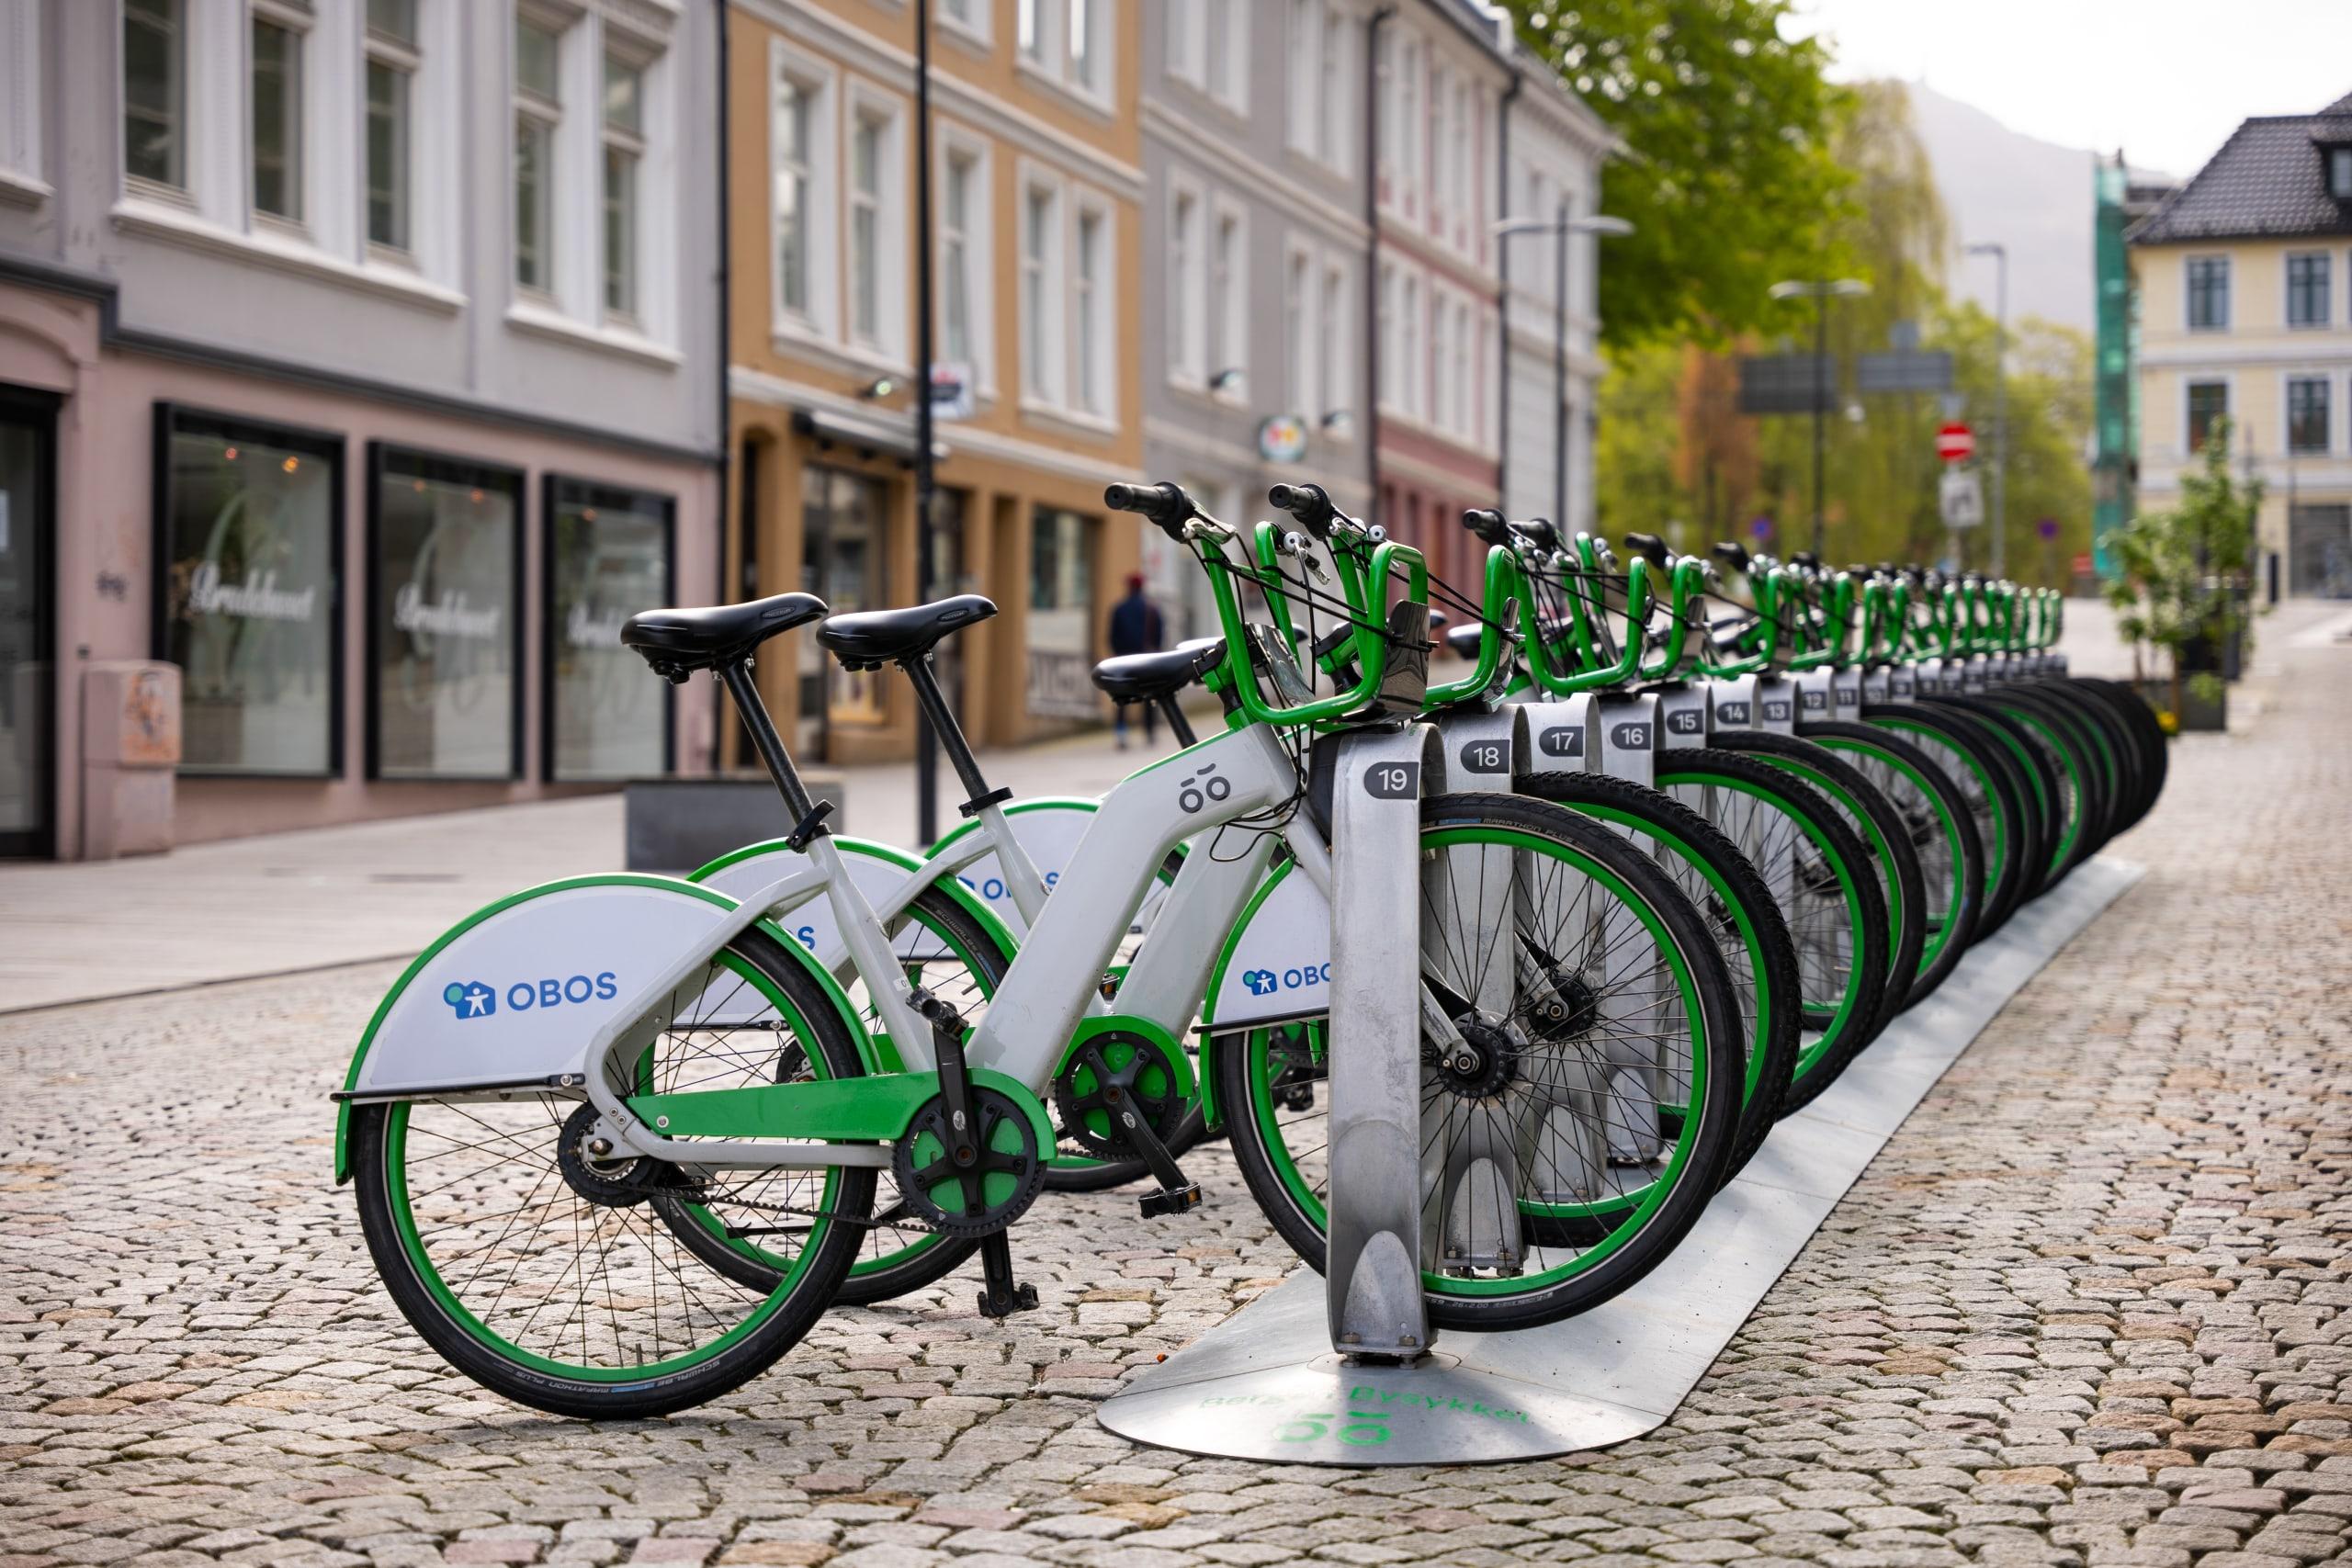 City bikes parked in a street in Bergen